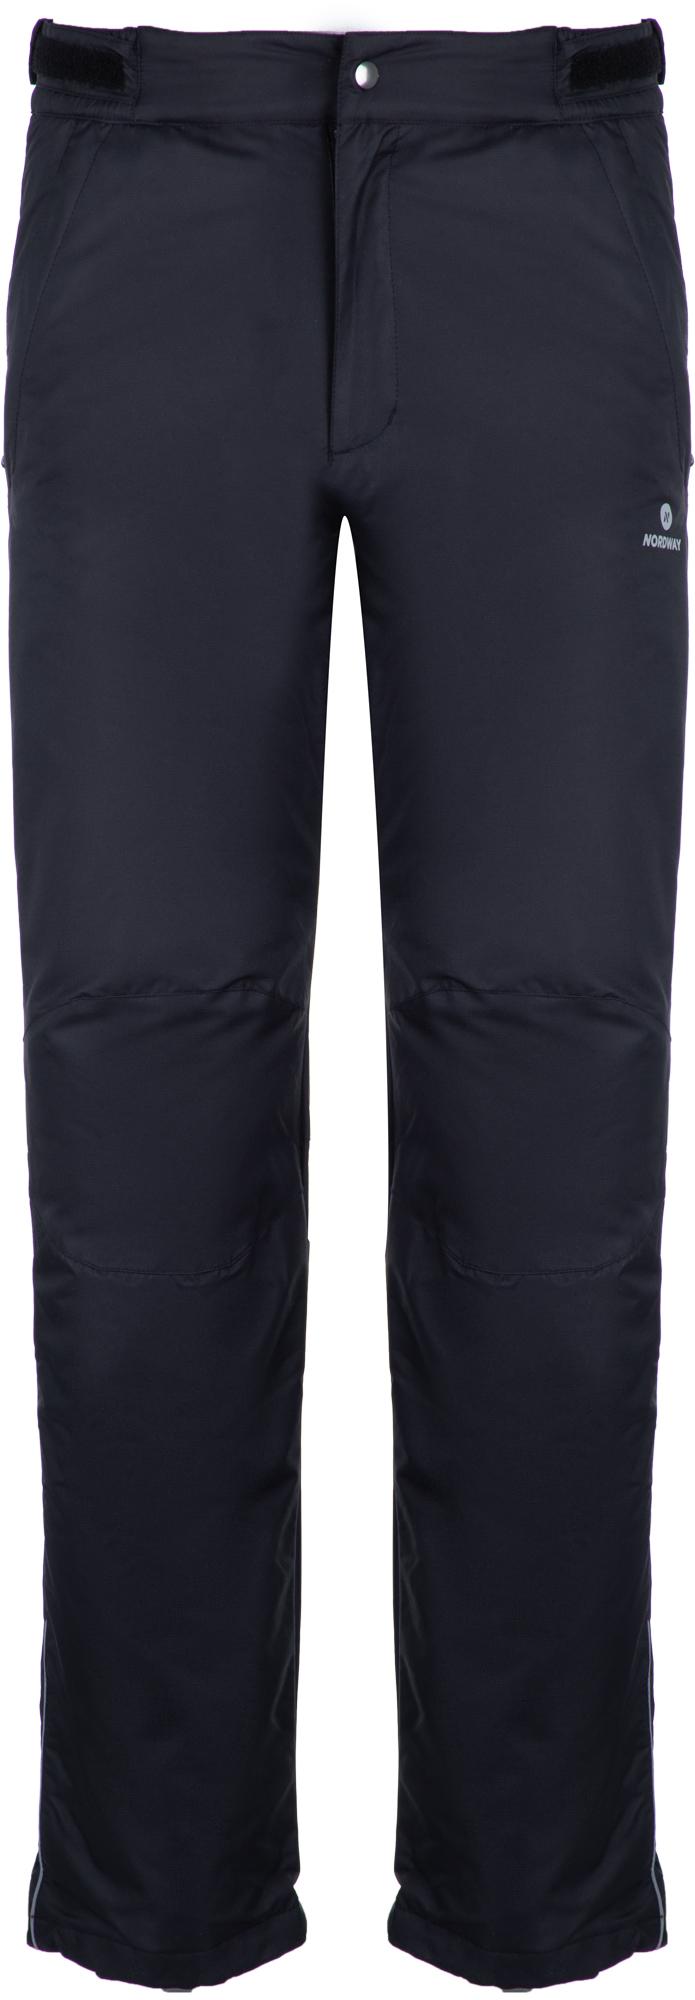 Nordway Брюки утепленные мужские Nordway, размер 50 nordway куртка утепленная мужская nordway размер 46